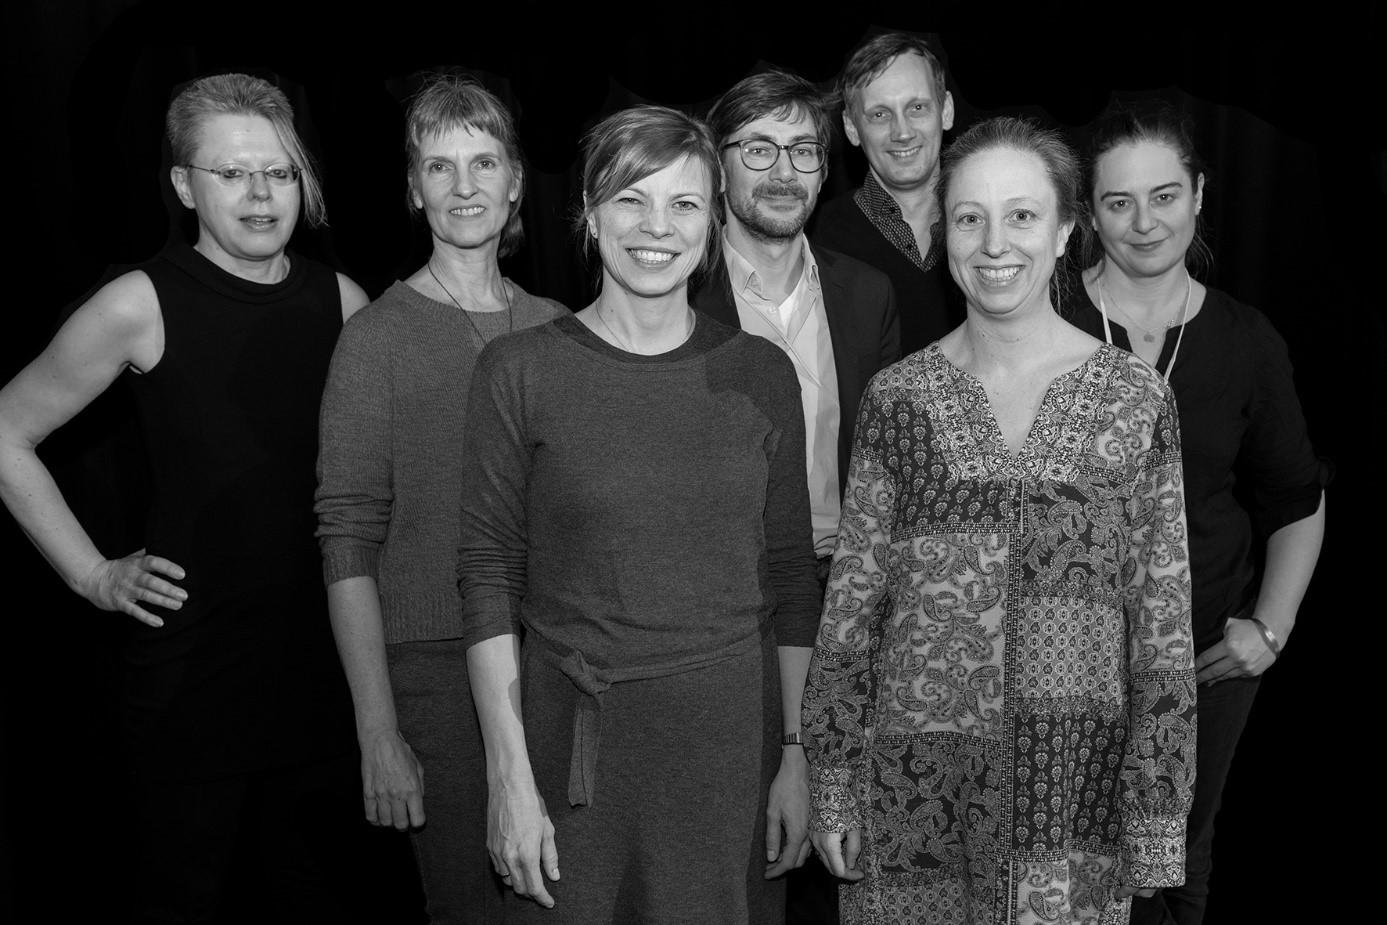 v.l.n.r.: K. Bieligk, K. Kirchhoff, B.A. Schmutz, U. Gössel, H. Wolff, D. Hartmann, K. Grübmeyer Foto: Ali Ghandtschi